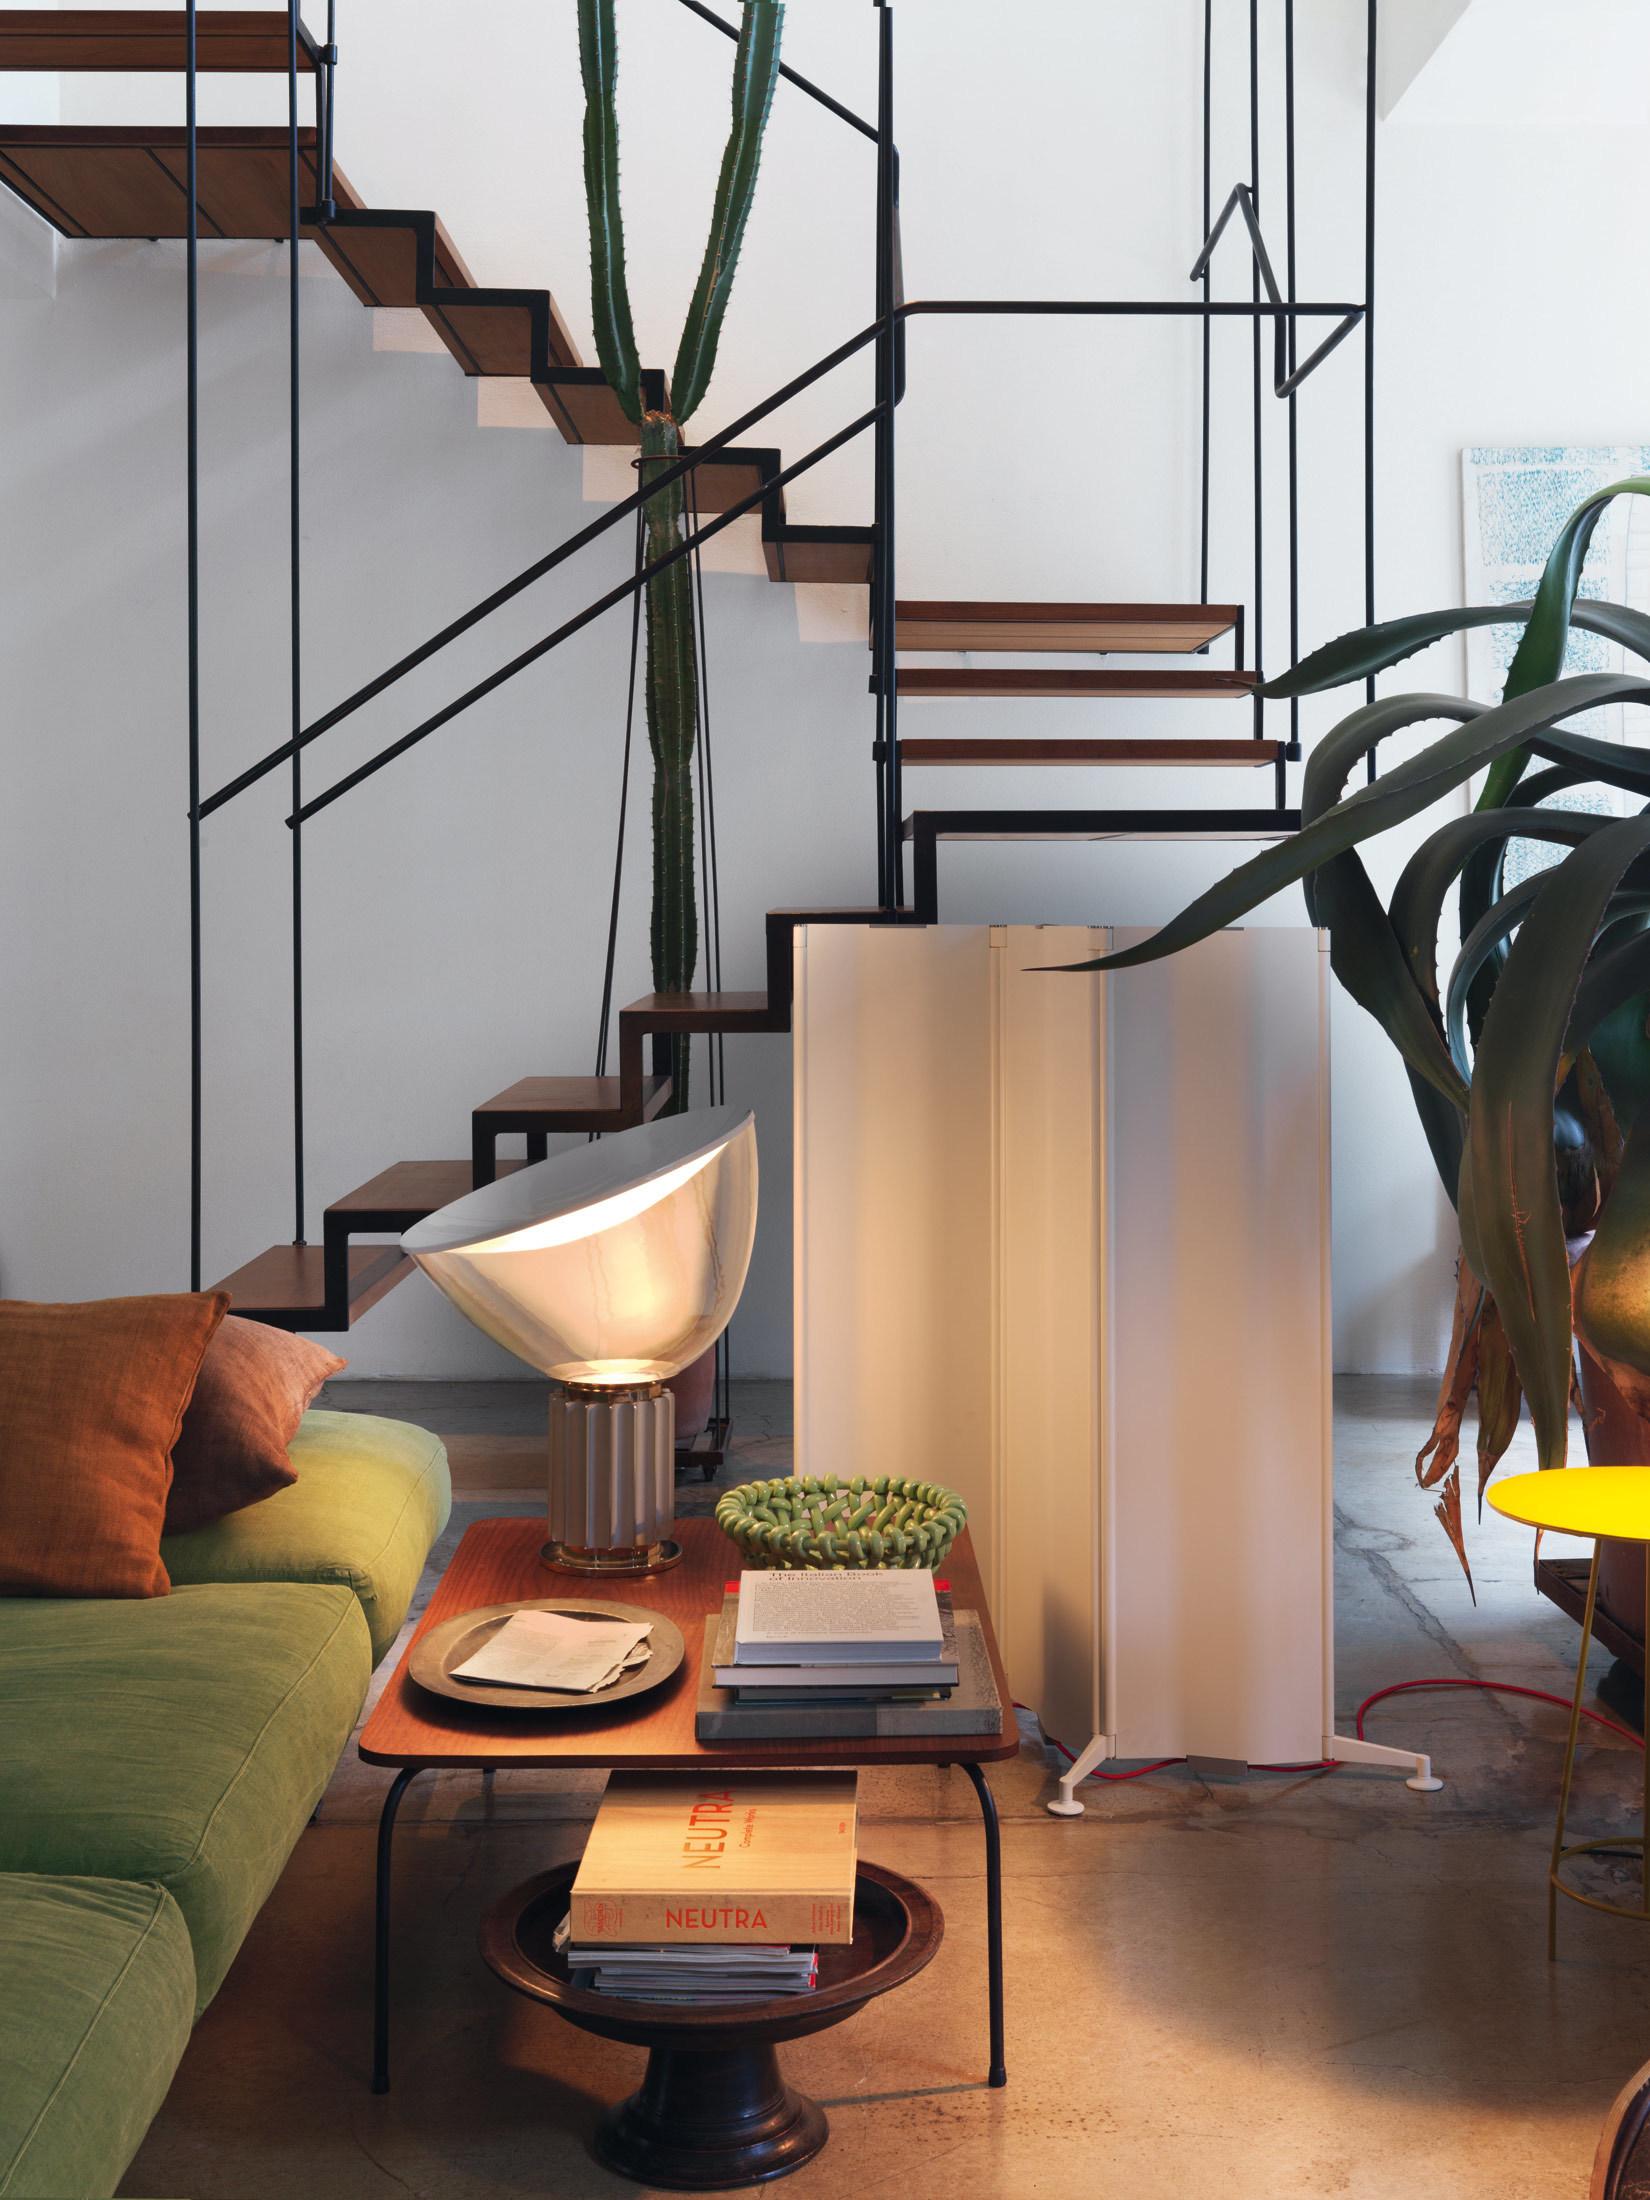 Sandwich tube - modern chimney design